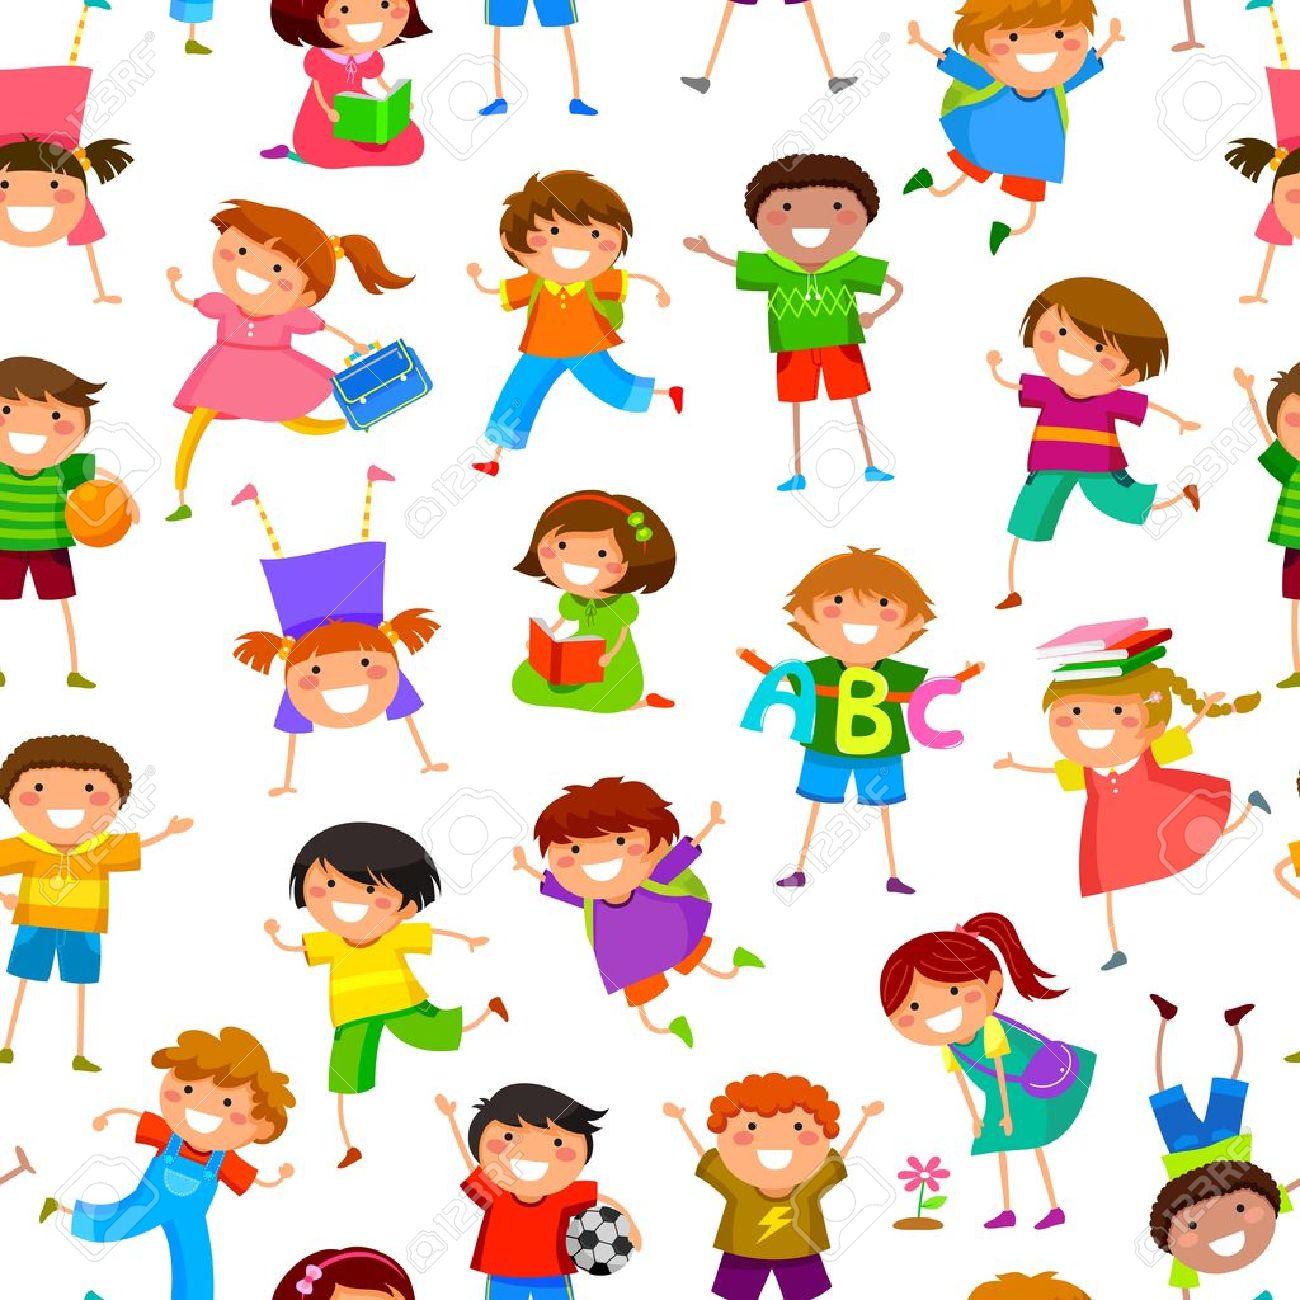 seamless pattern with cartoon kids - 21076472